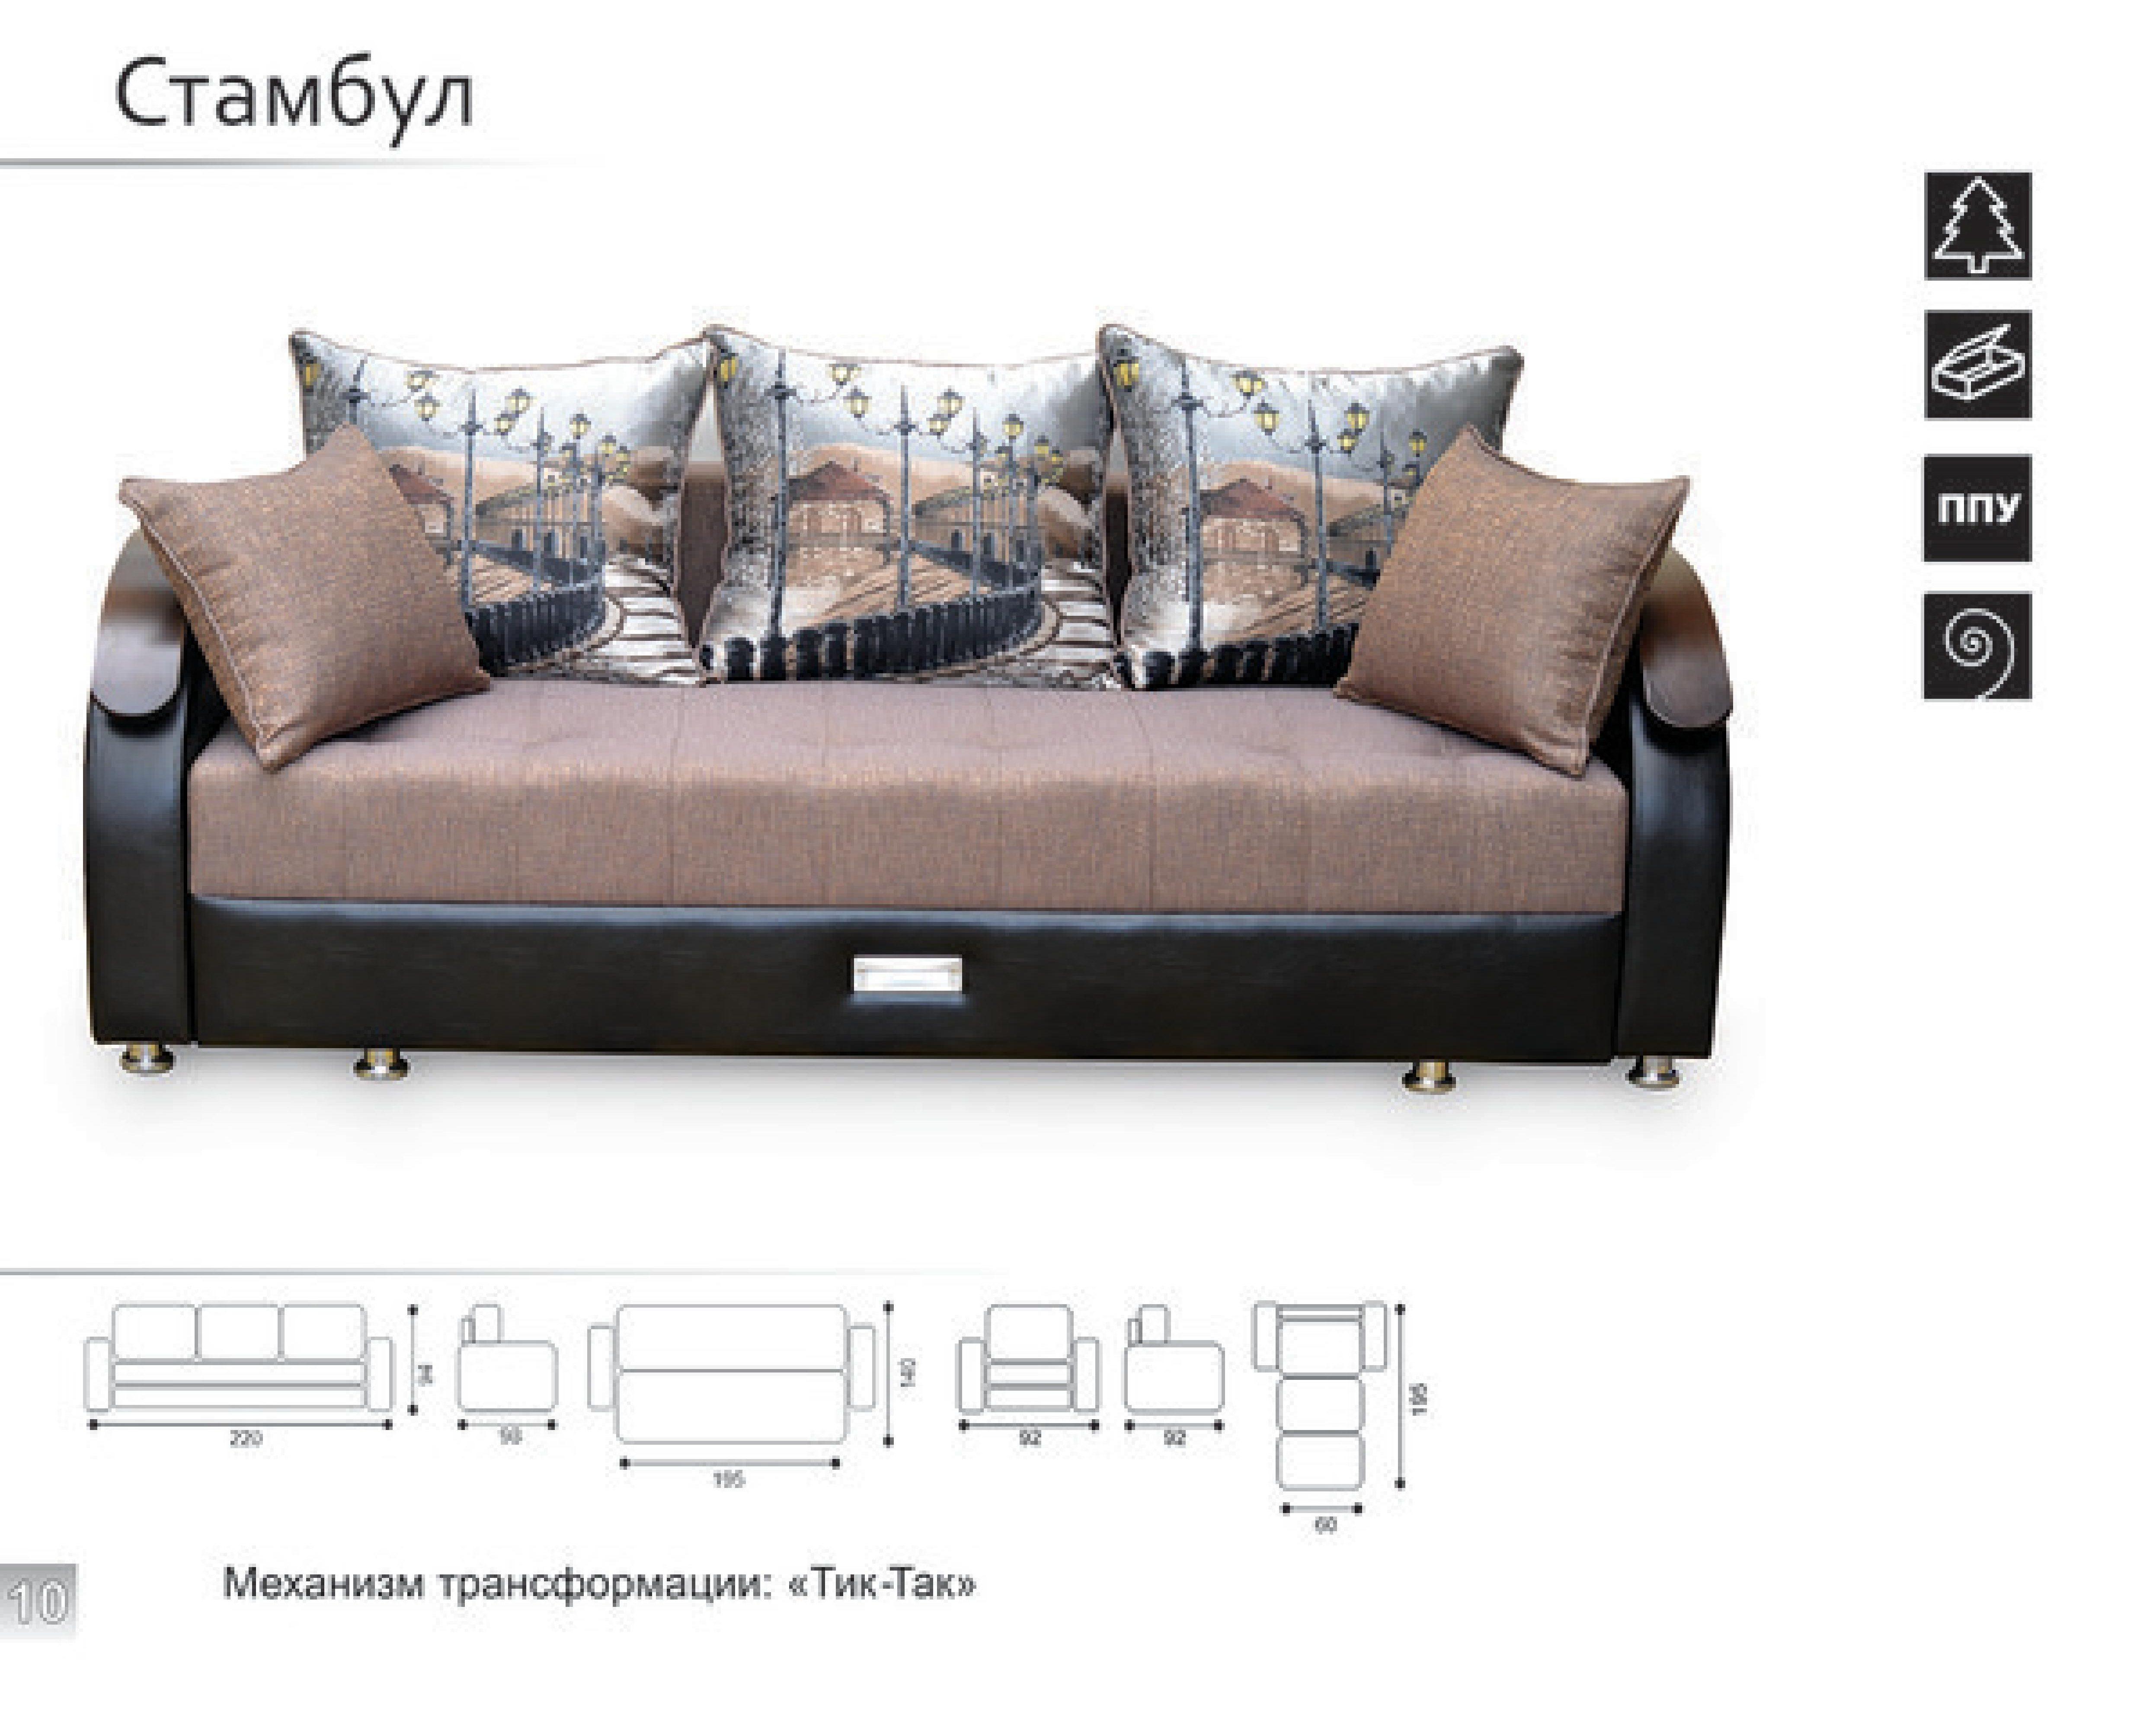 купить диван недорого салон мебели Karpov Kmv